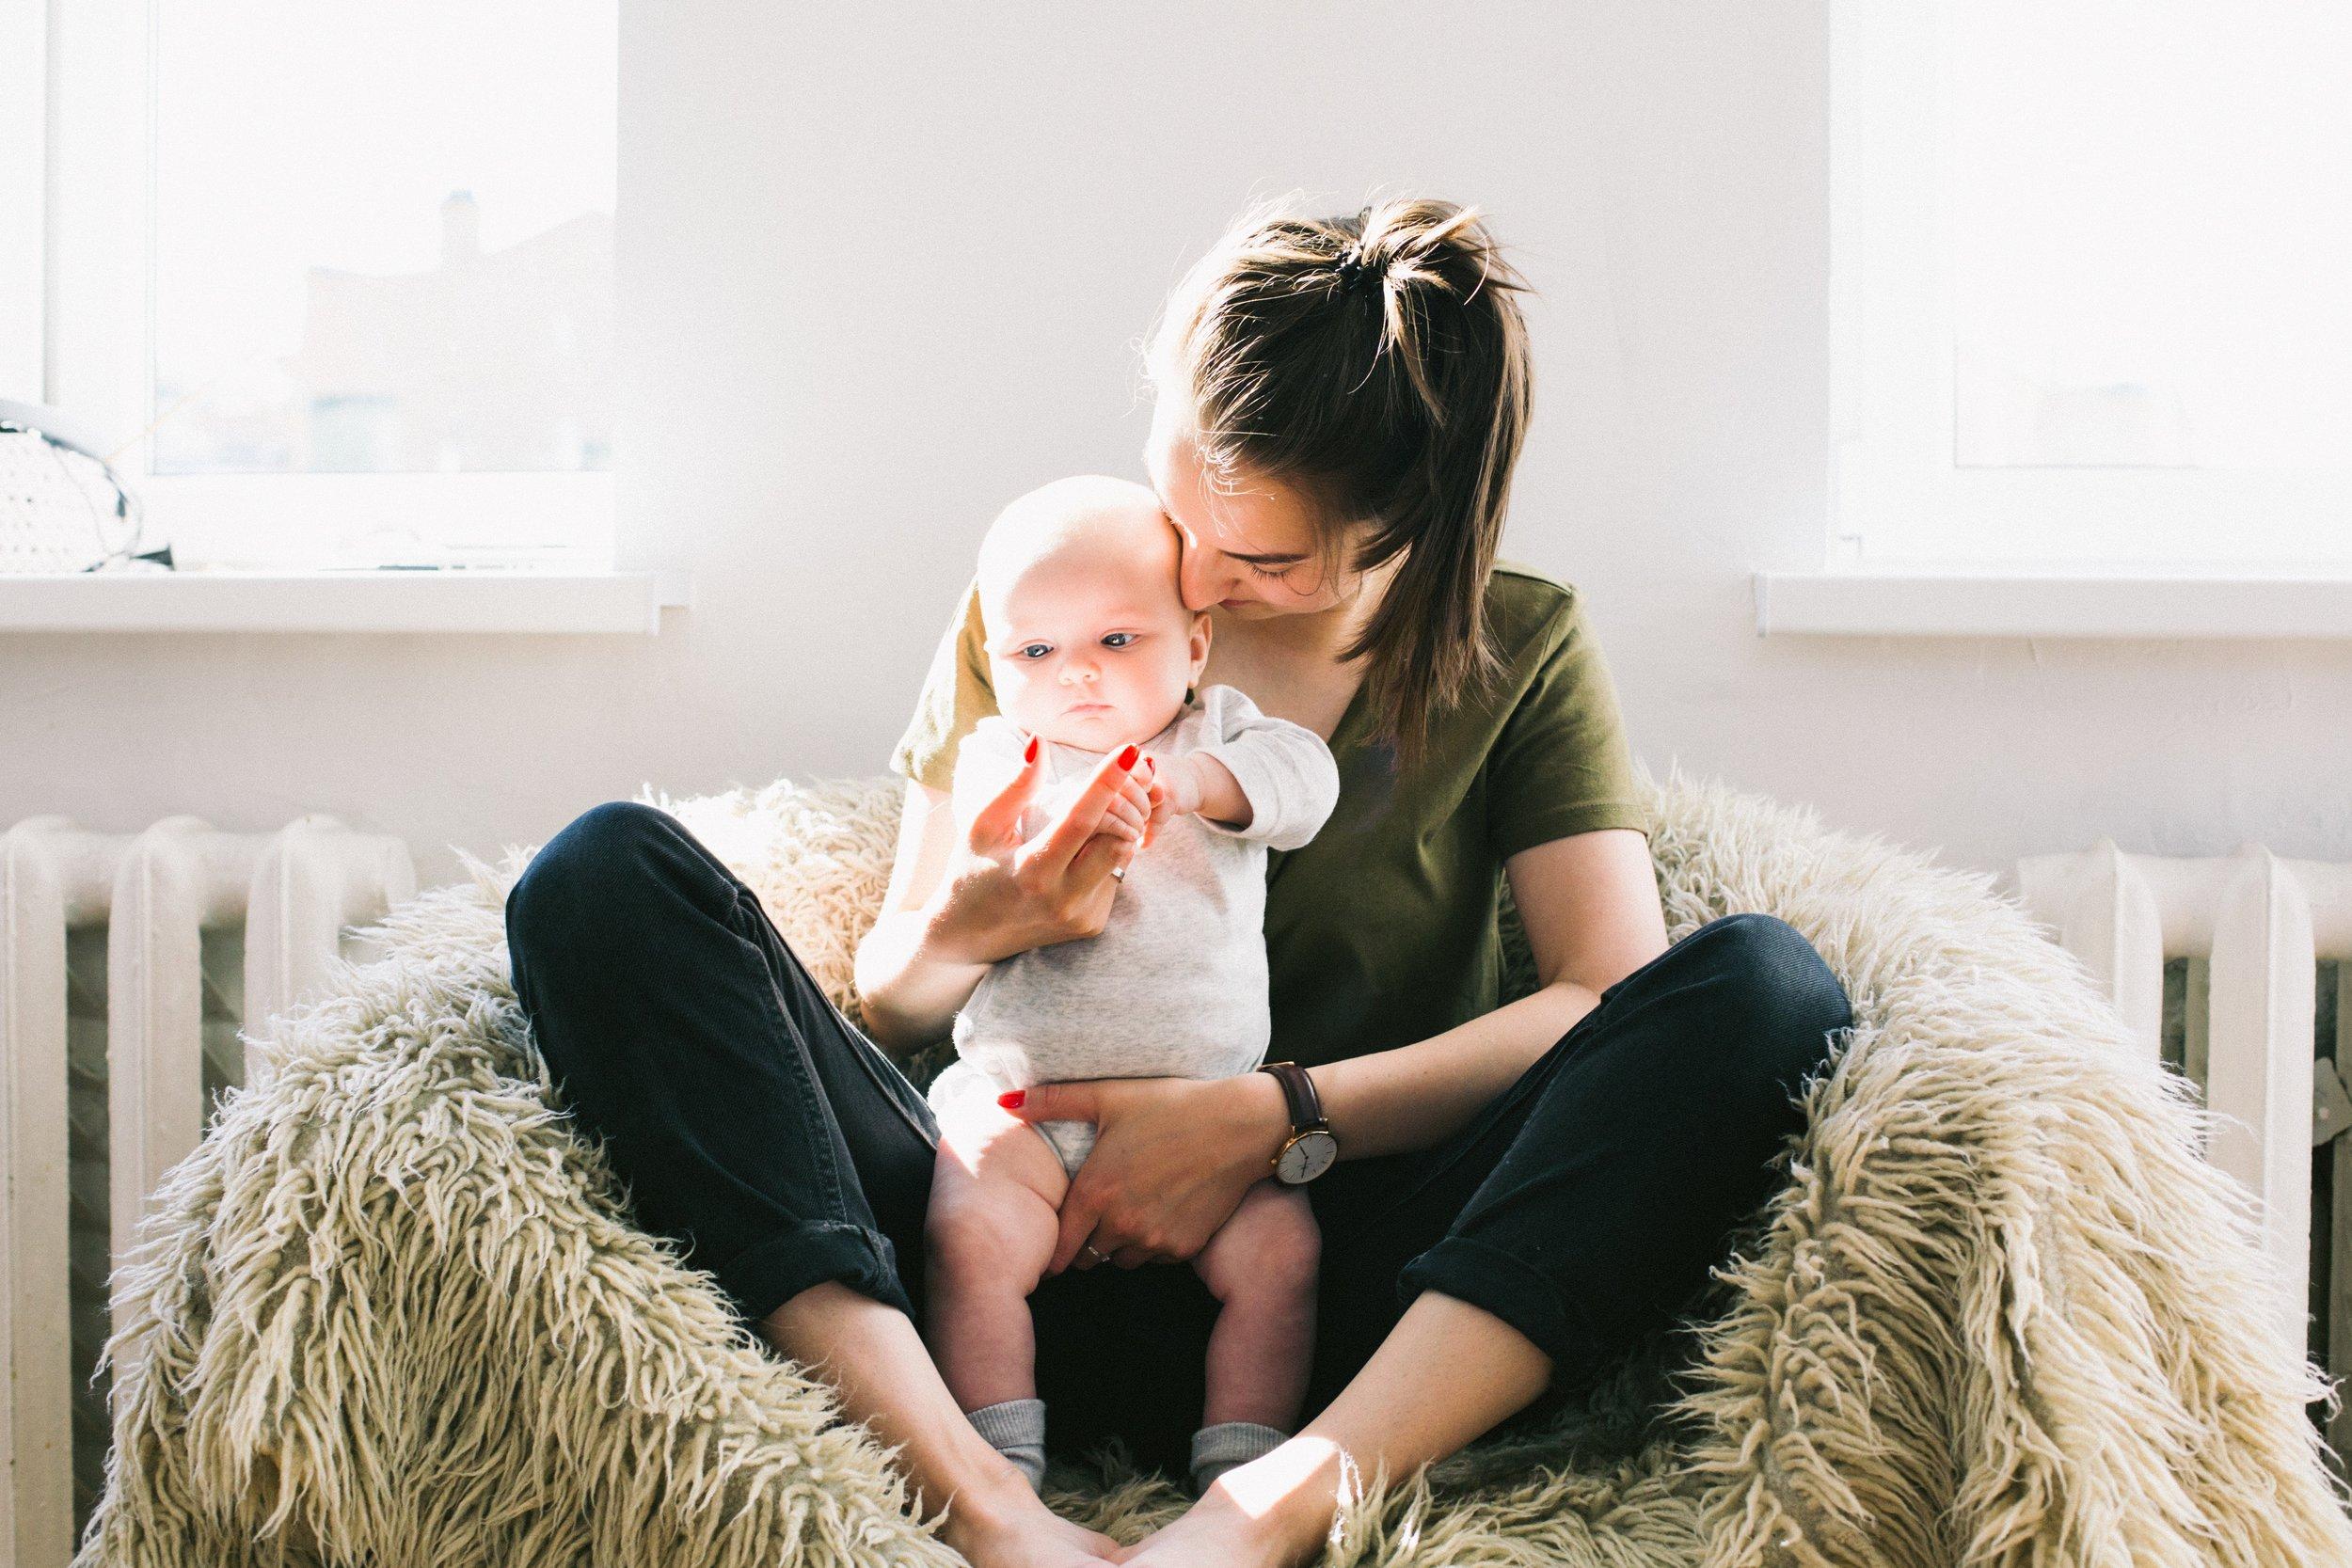 adult-baby-babysitter-698878.jpg